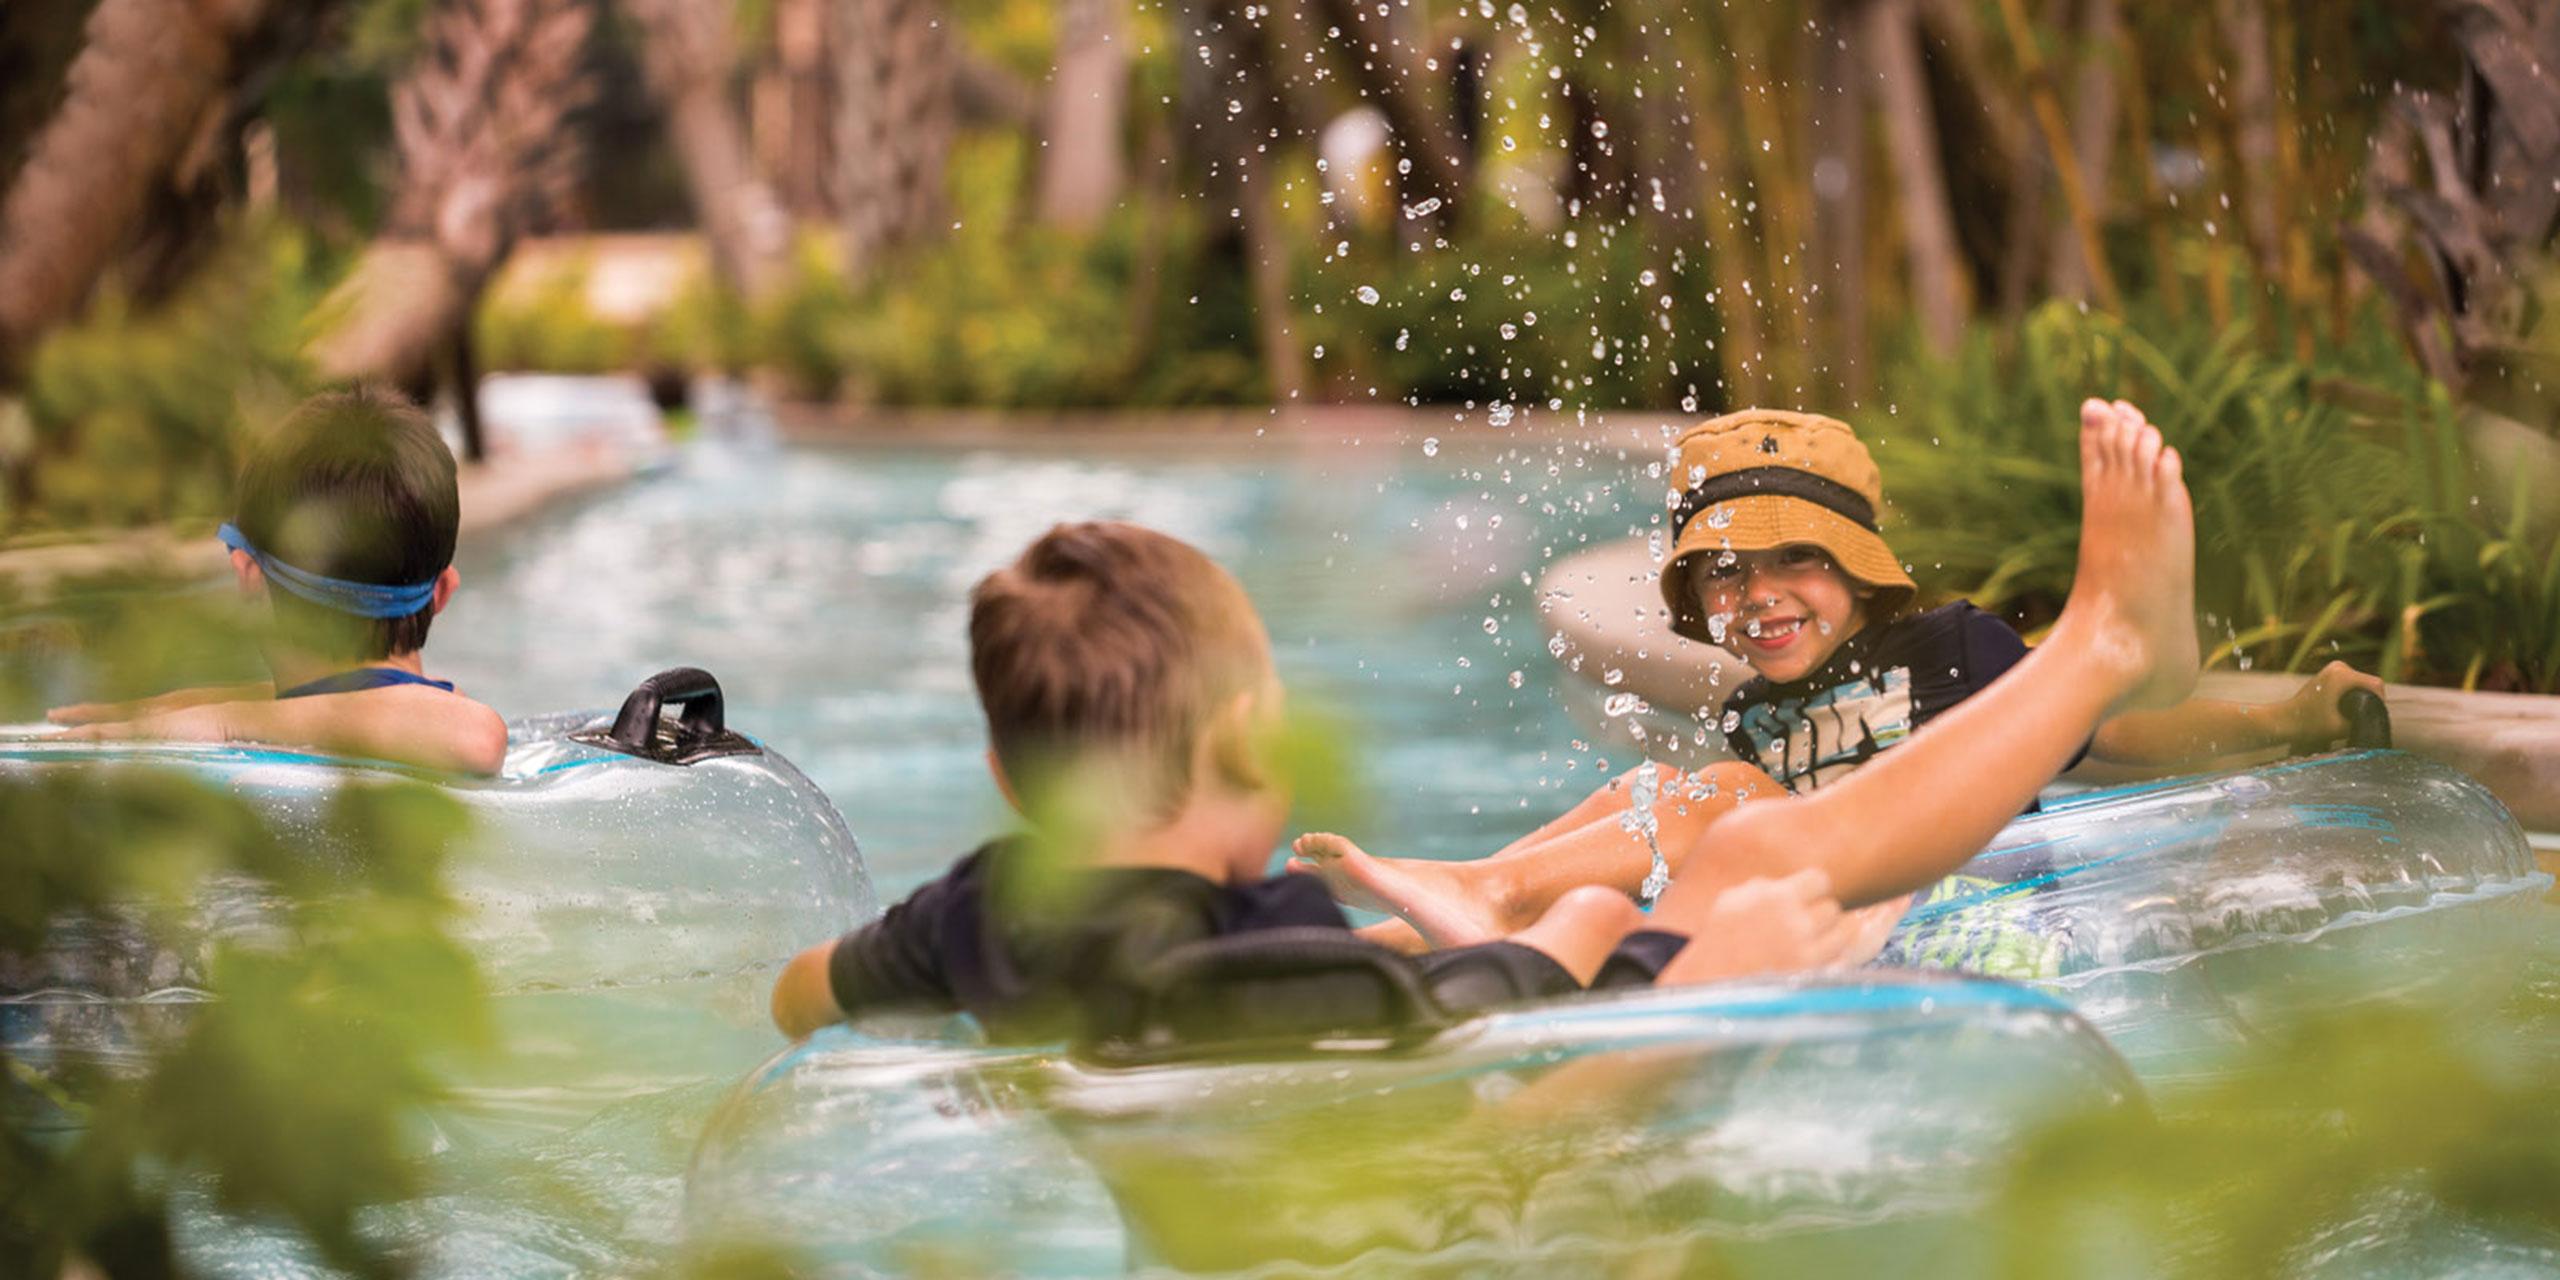 Four Seasons Resort Orlando at Walt Disney World Resort; Courtesy of Four Seasons Resort Orlando at Walt Disney World Resort